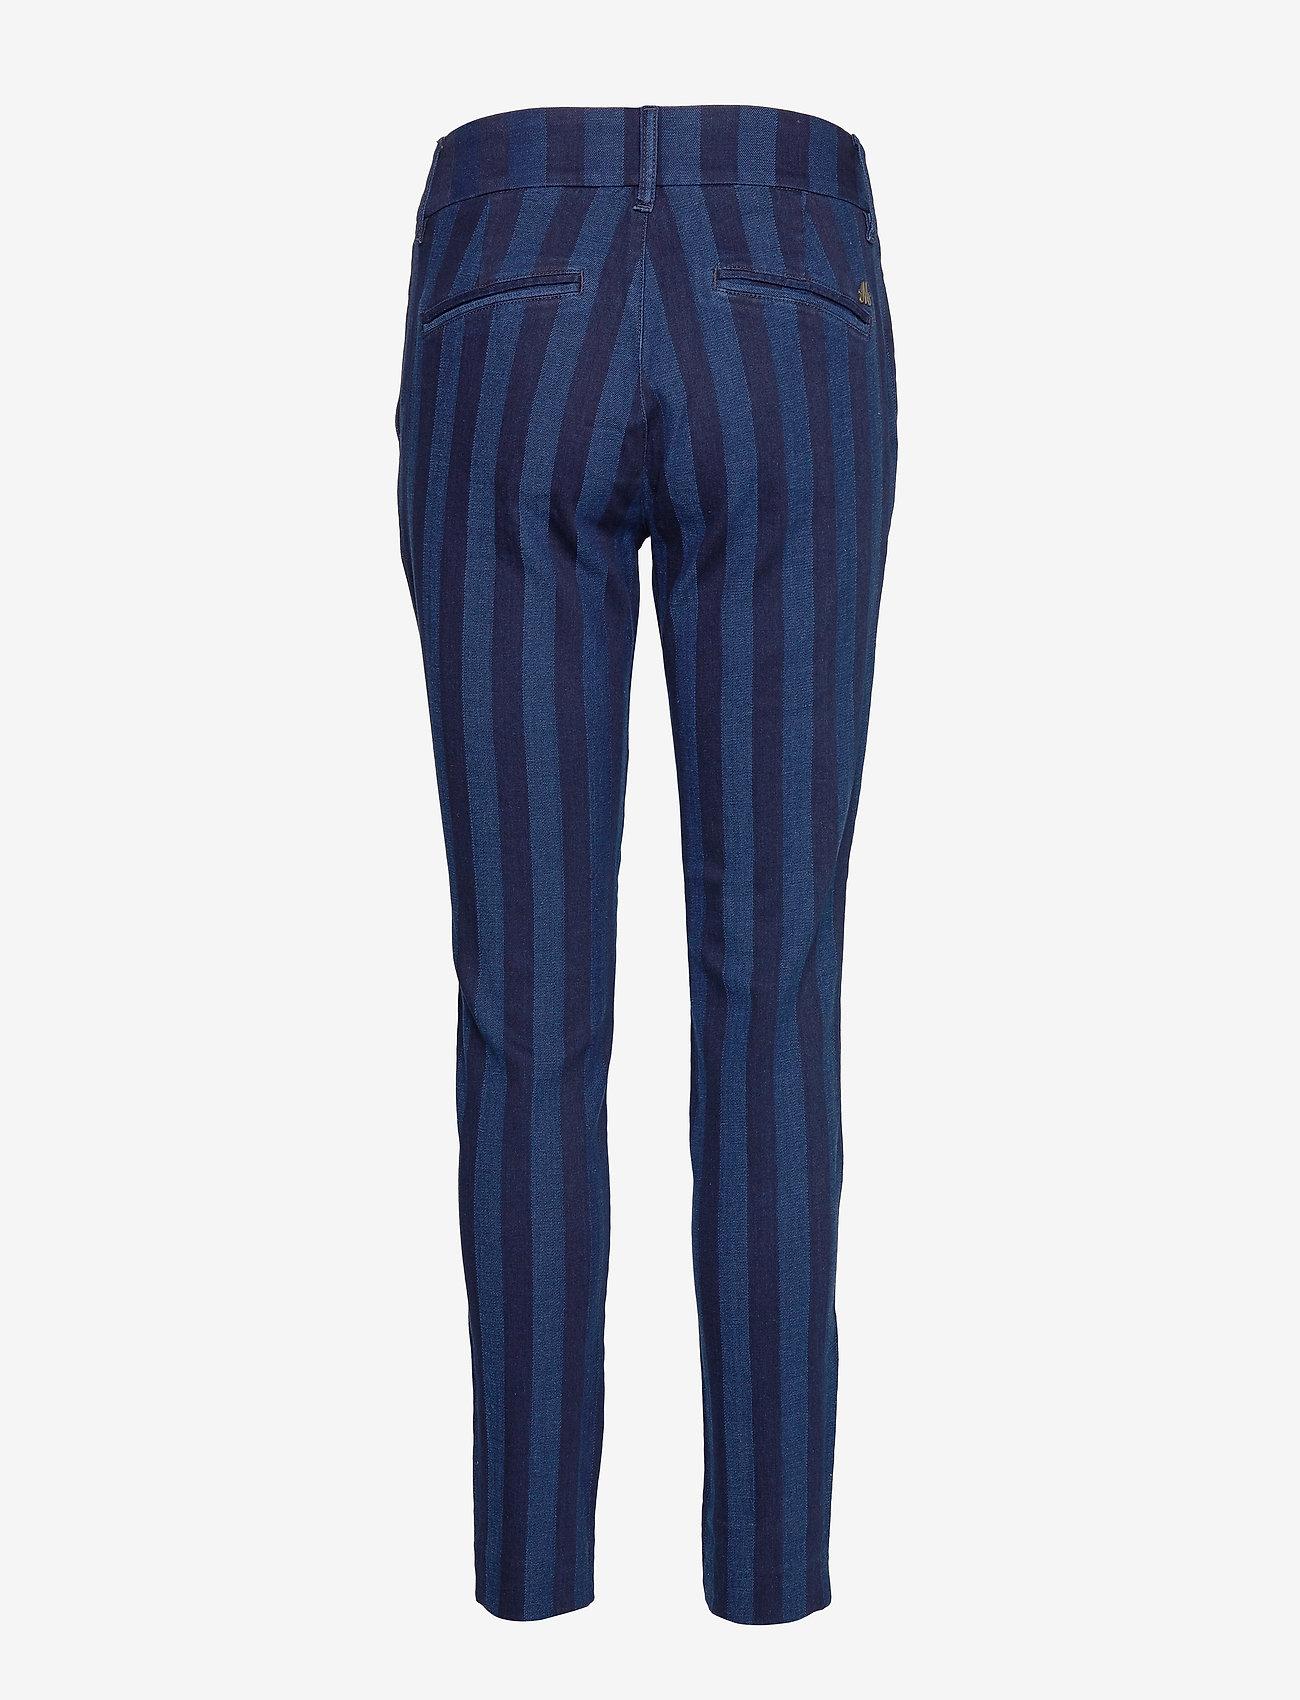 Mos Mosh Blake Stripe Pant - Byxor Dark Blue